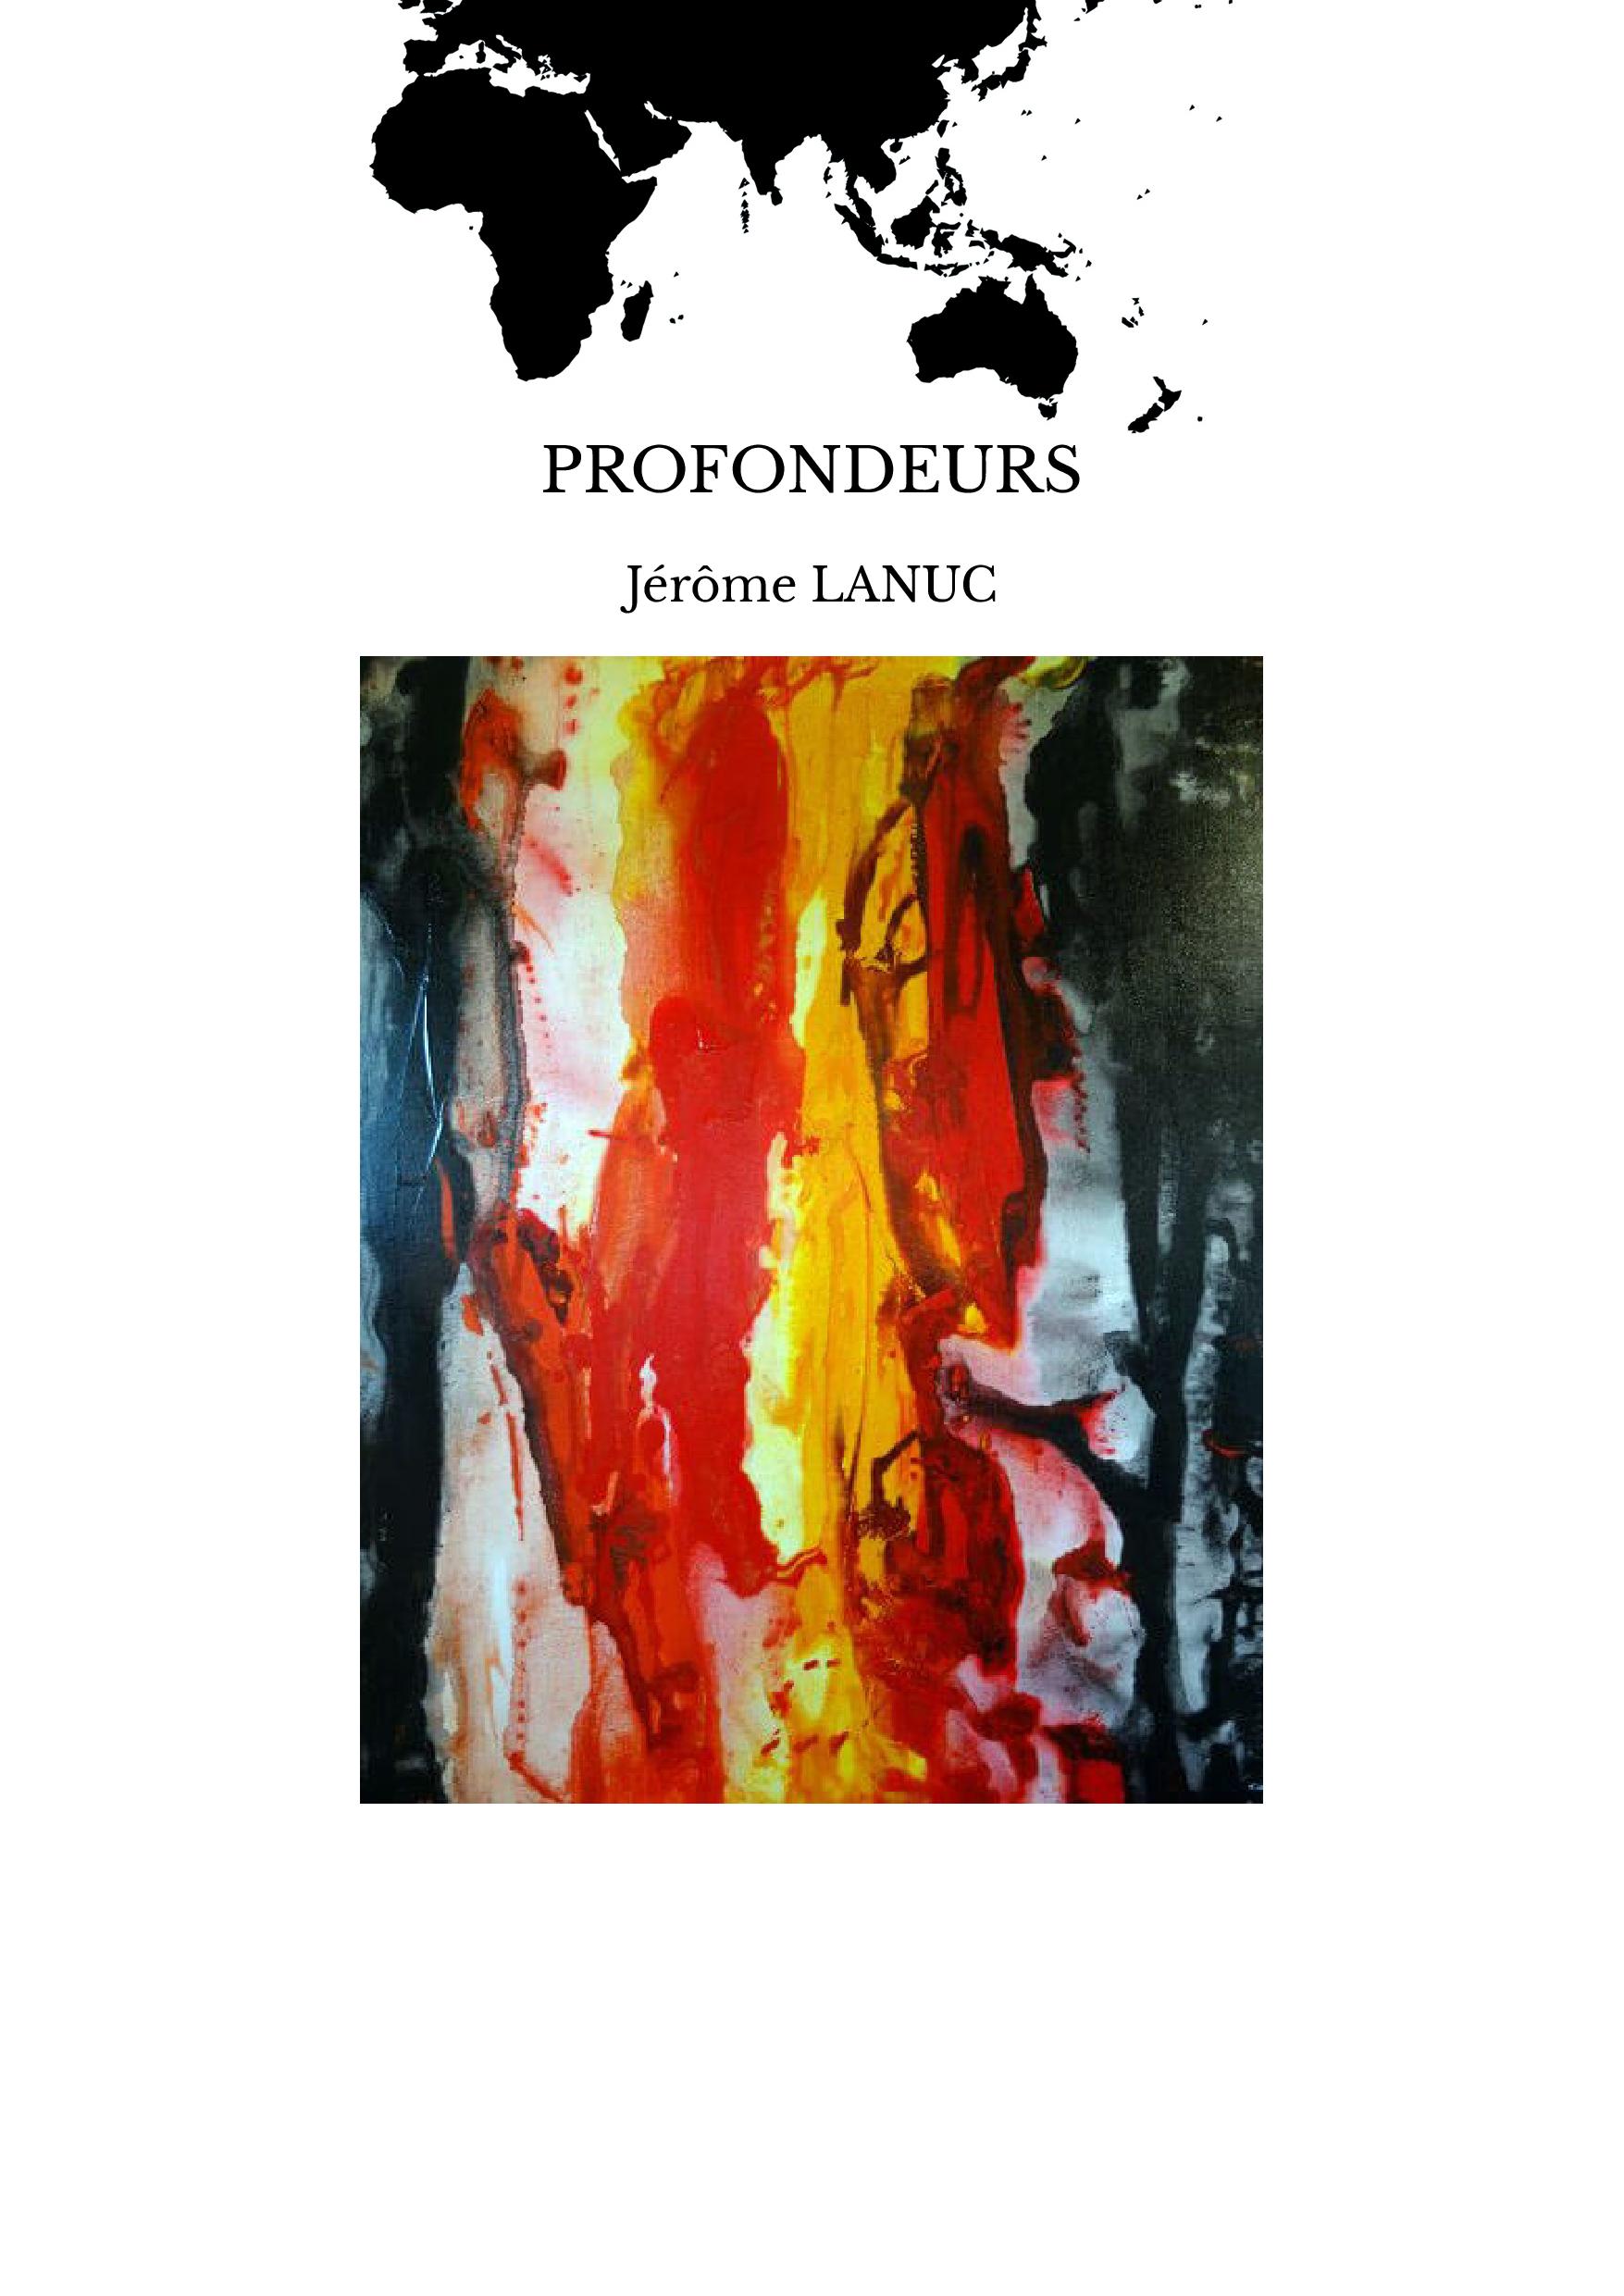 PROFONDEURS